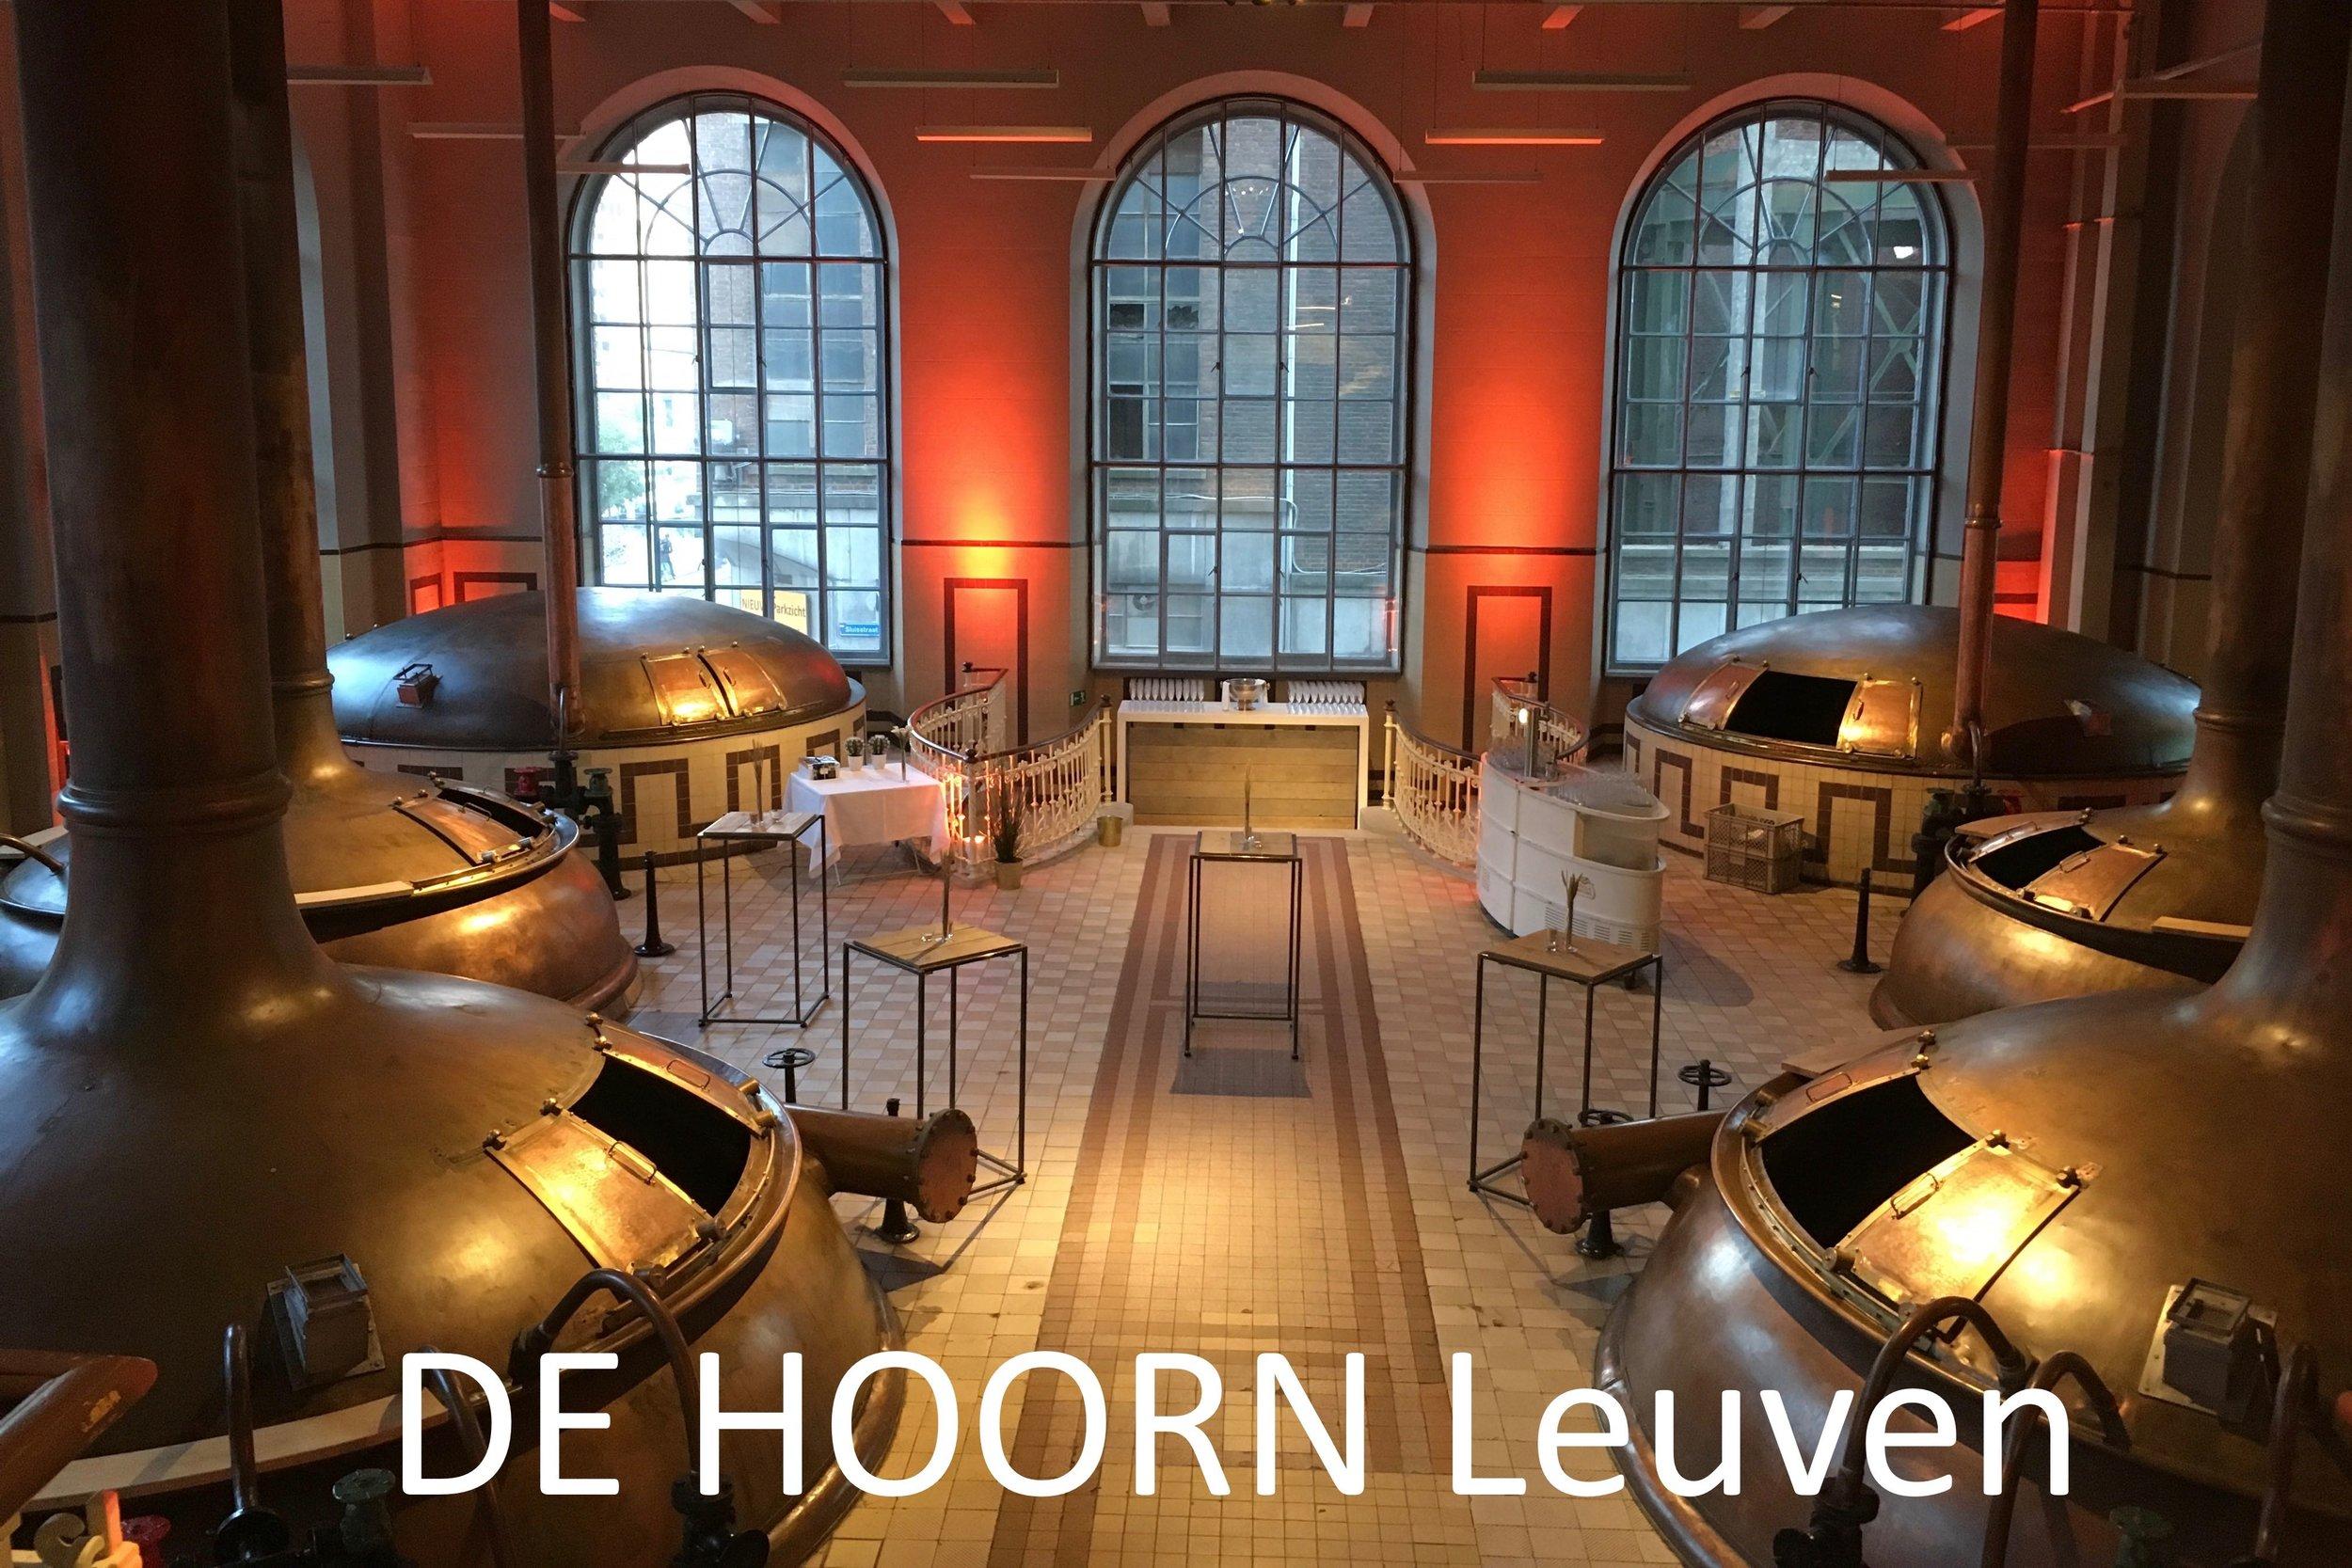 Copy of DE HOORS by FOODstories